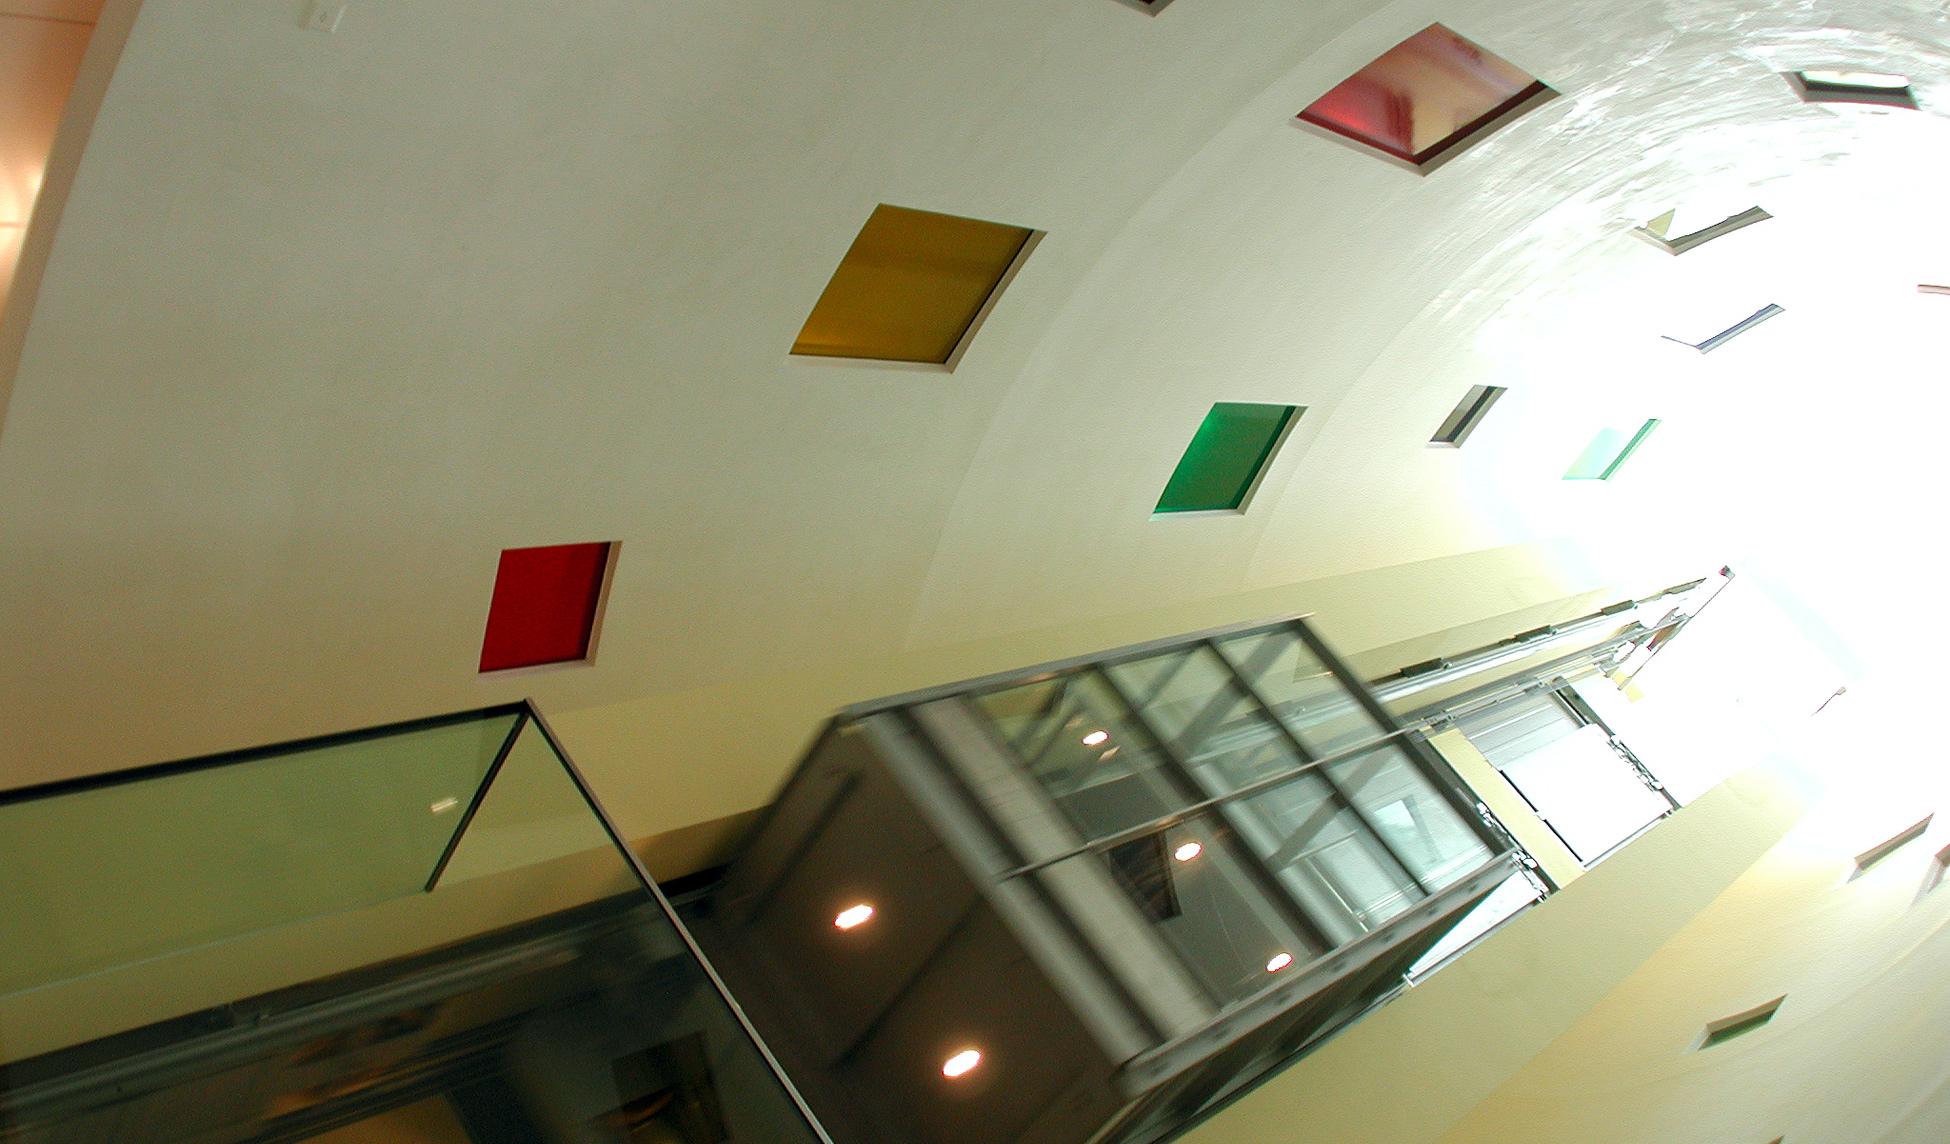 Hotel Sedartis, Thalwil